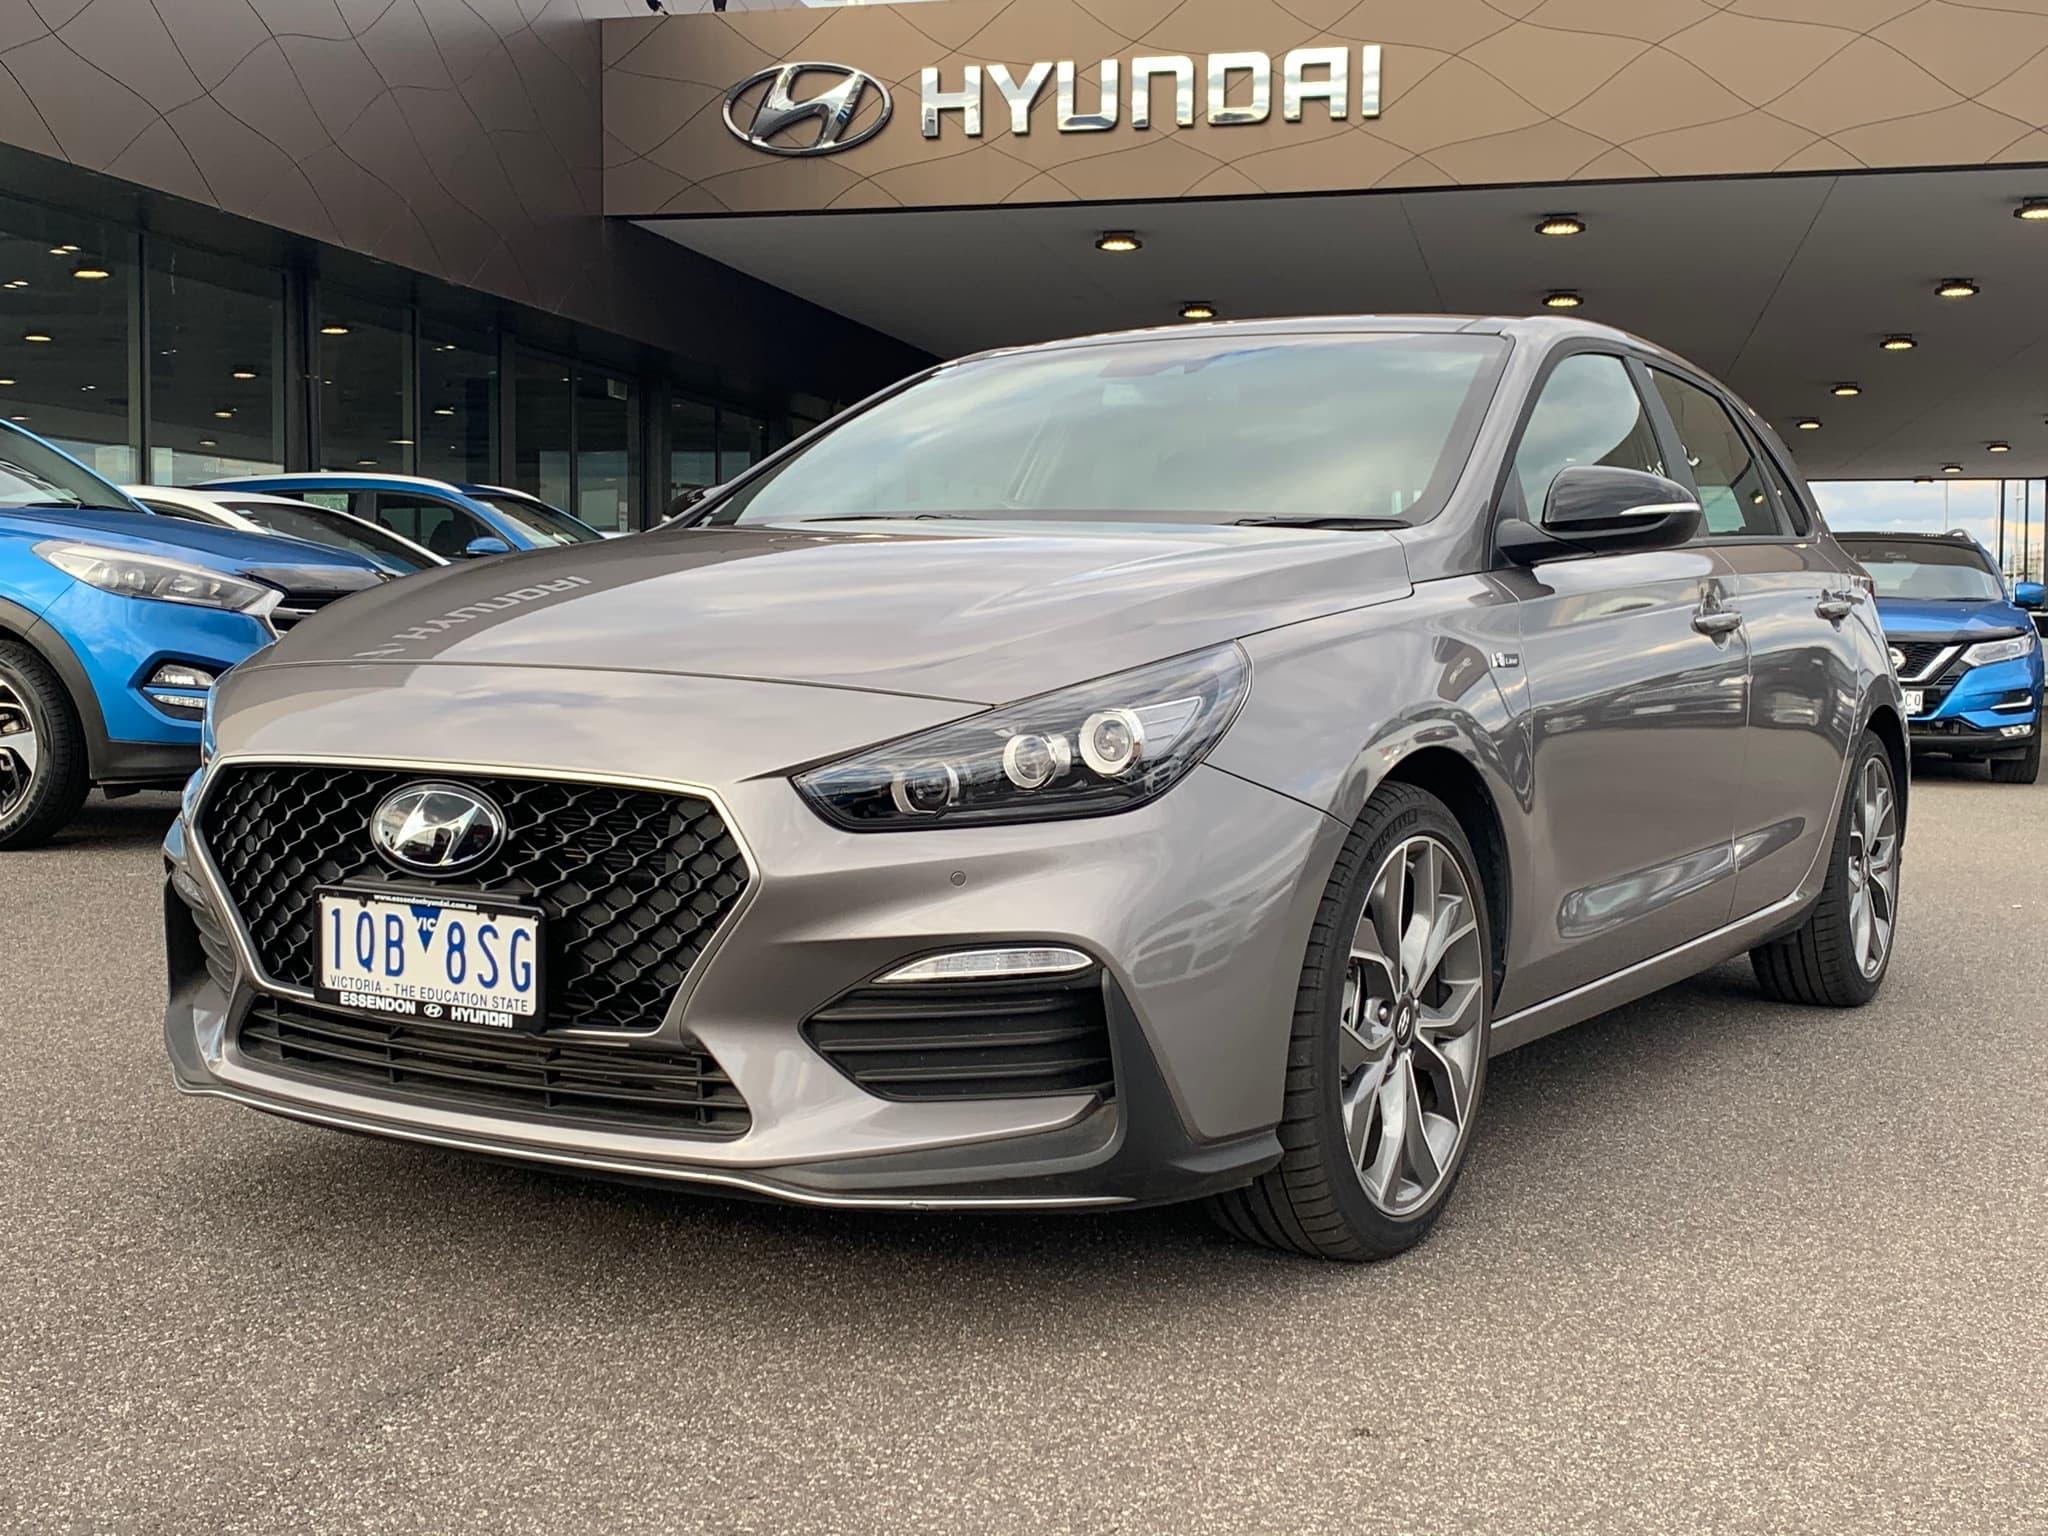 2019 Hyundai i30 N Line Premium Auto MY19 - image 4